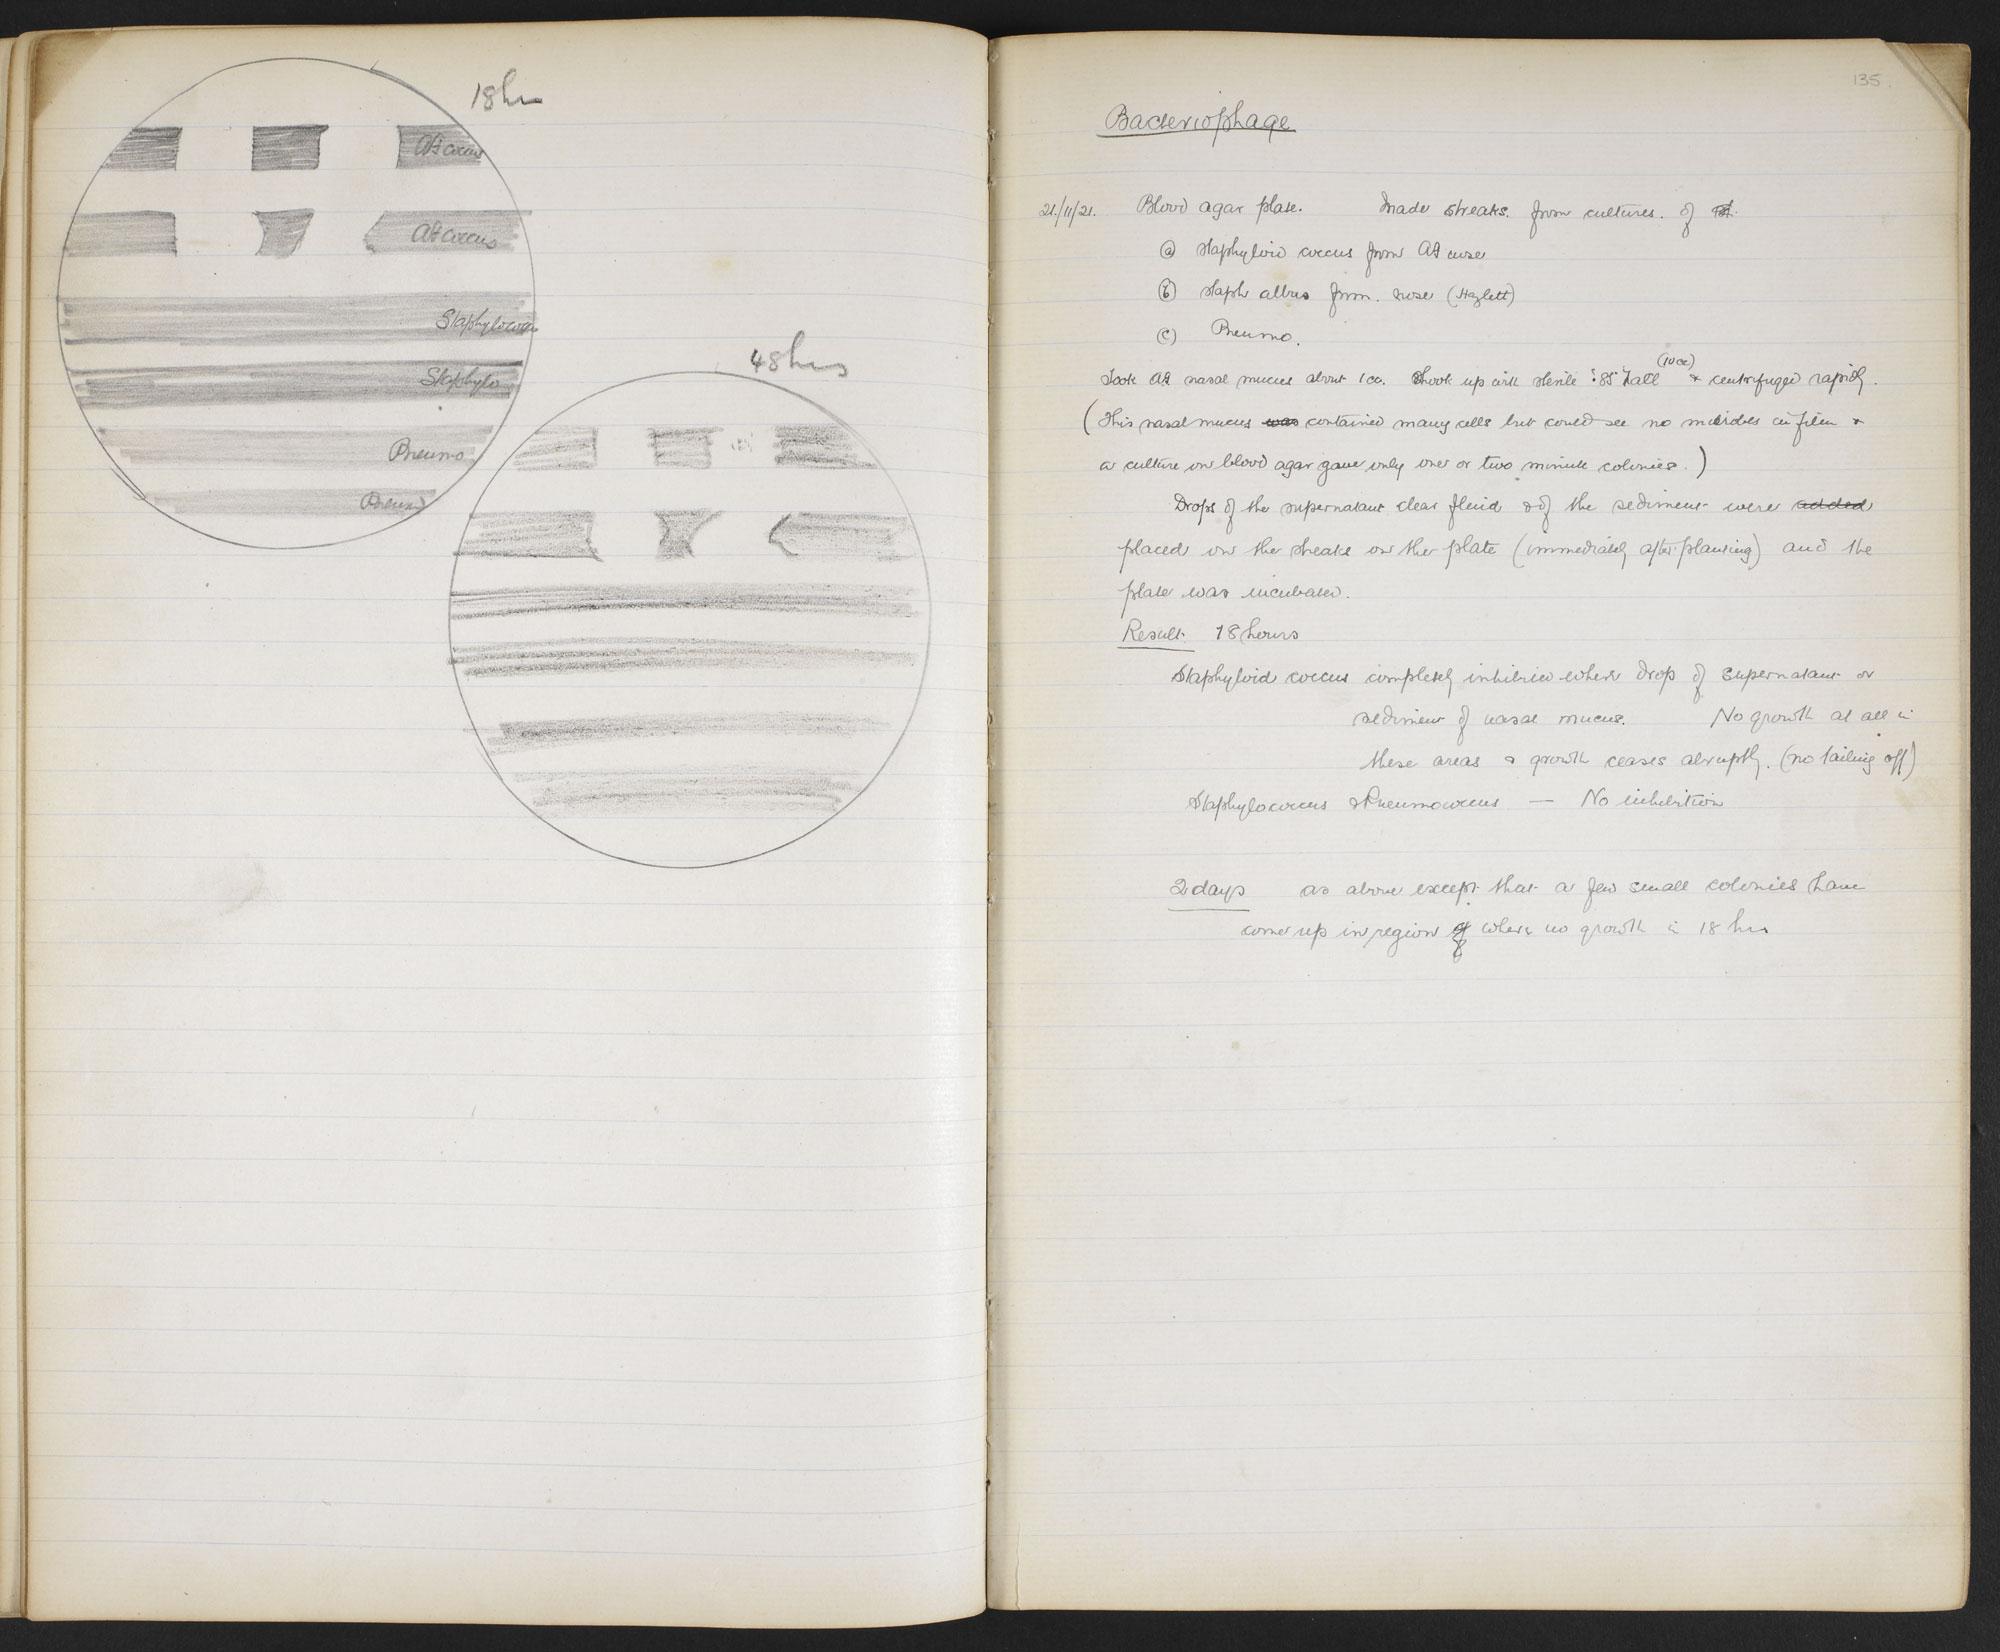 Sir Alexander Fleming's Lab Books